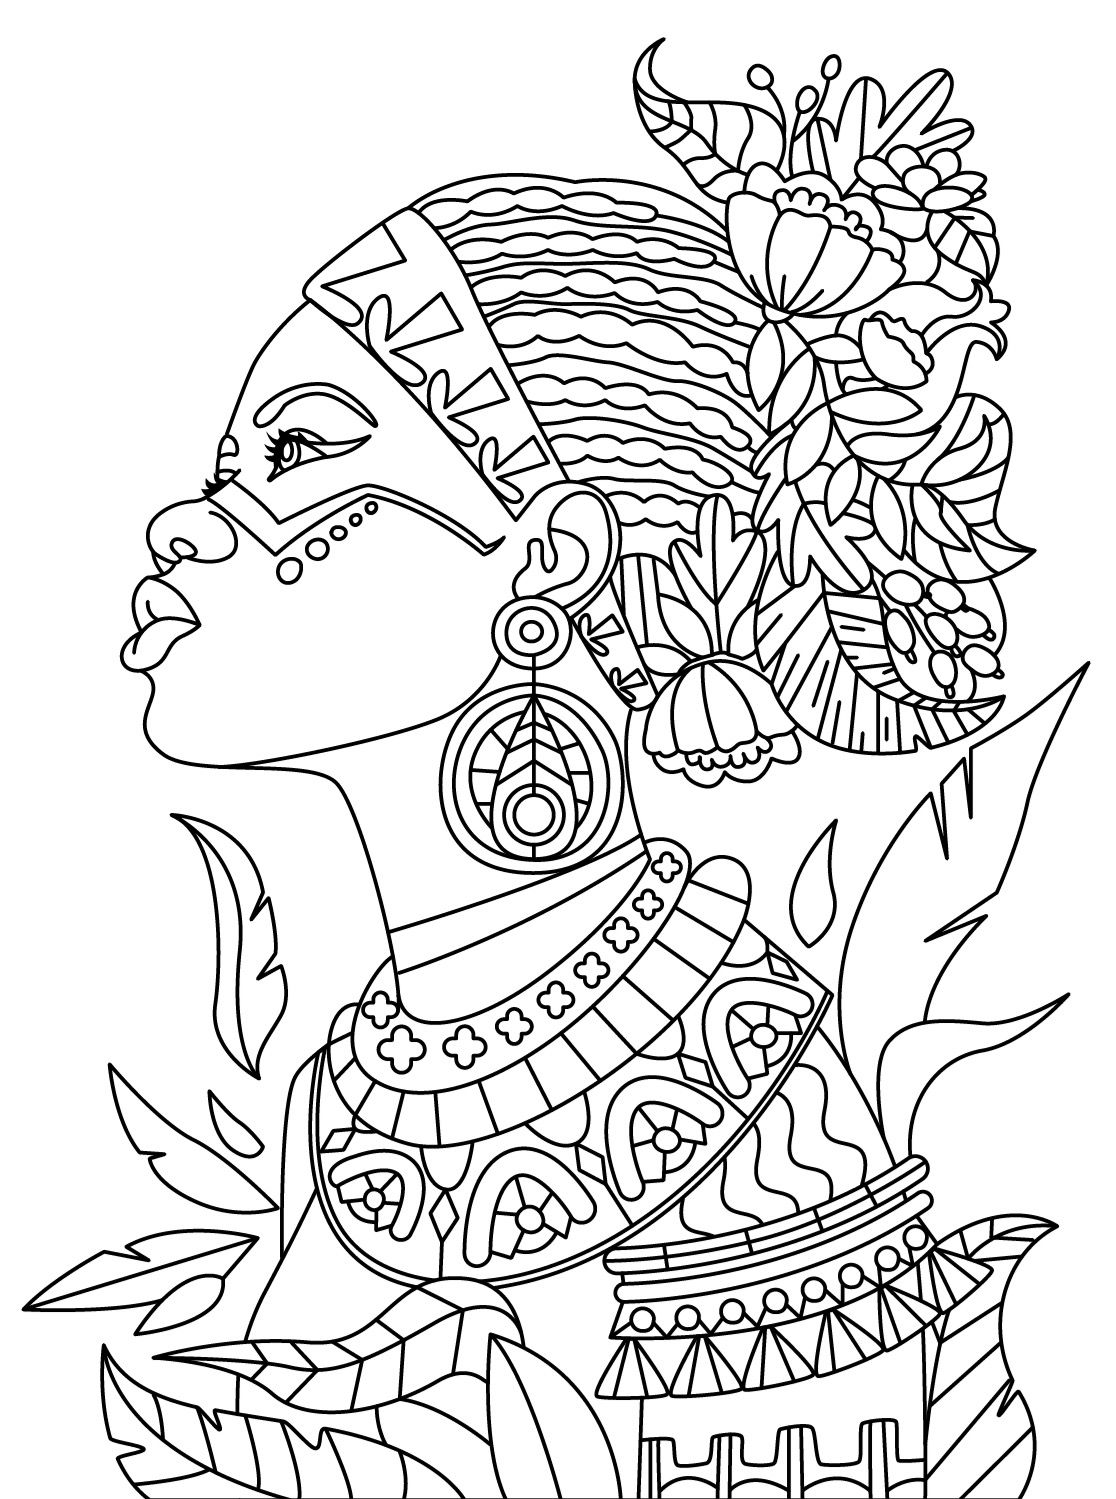 1116x1499 African Colorish Coloring Book App For Adults Mandala Relax